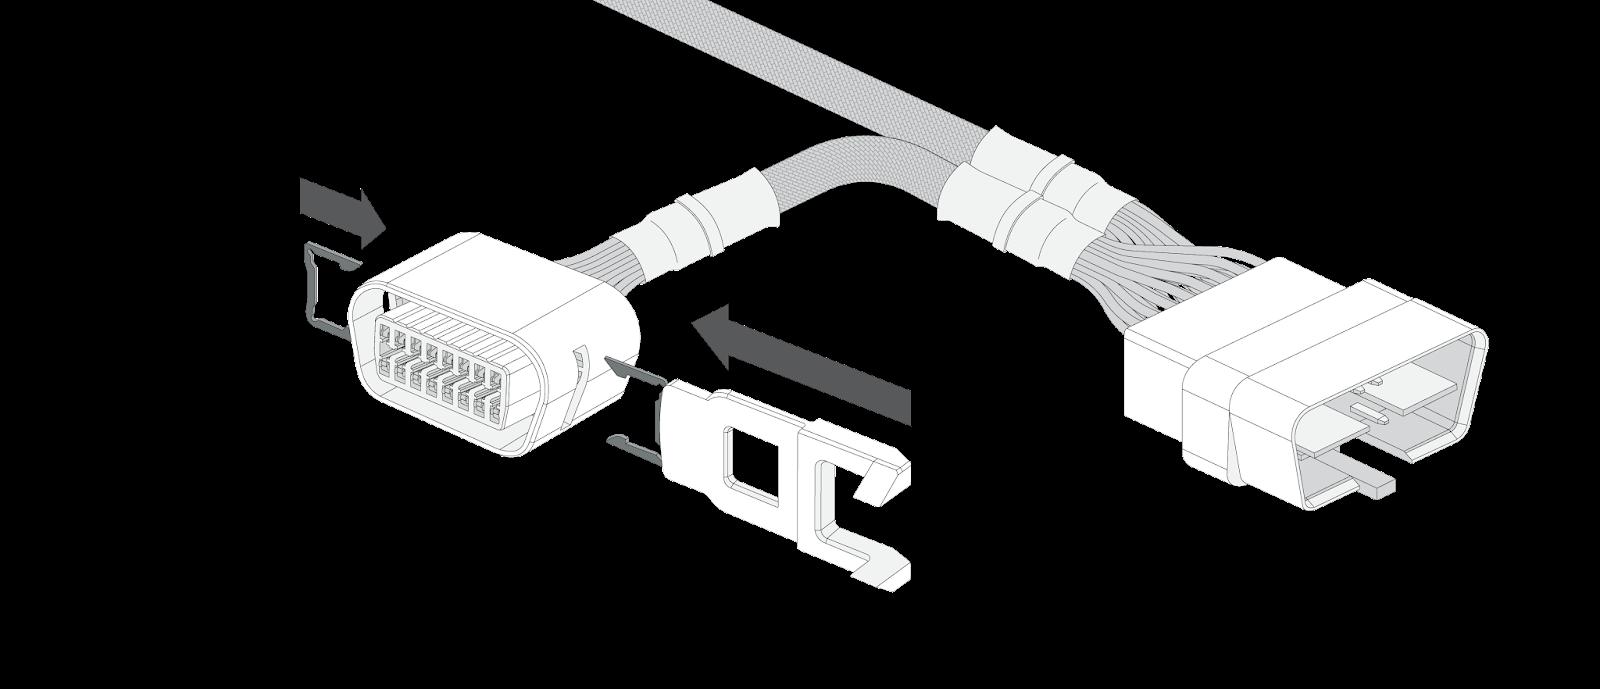 universal-harness-setup-figure10.png